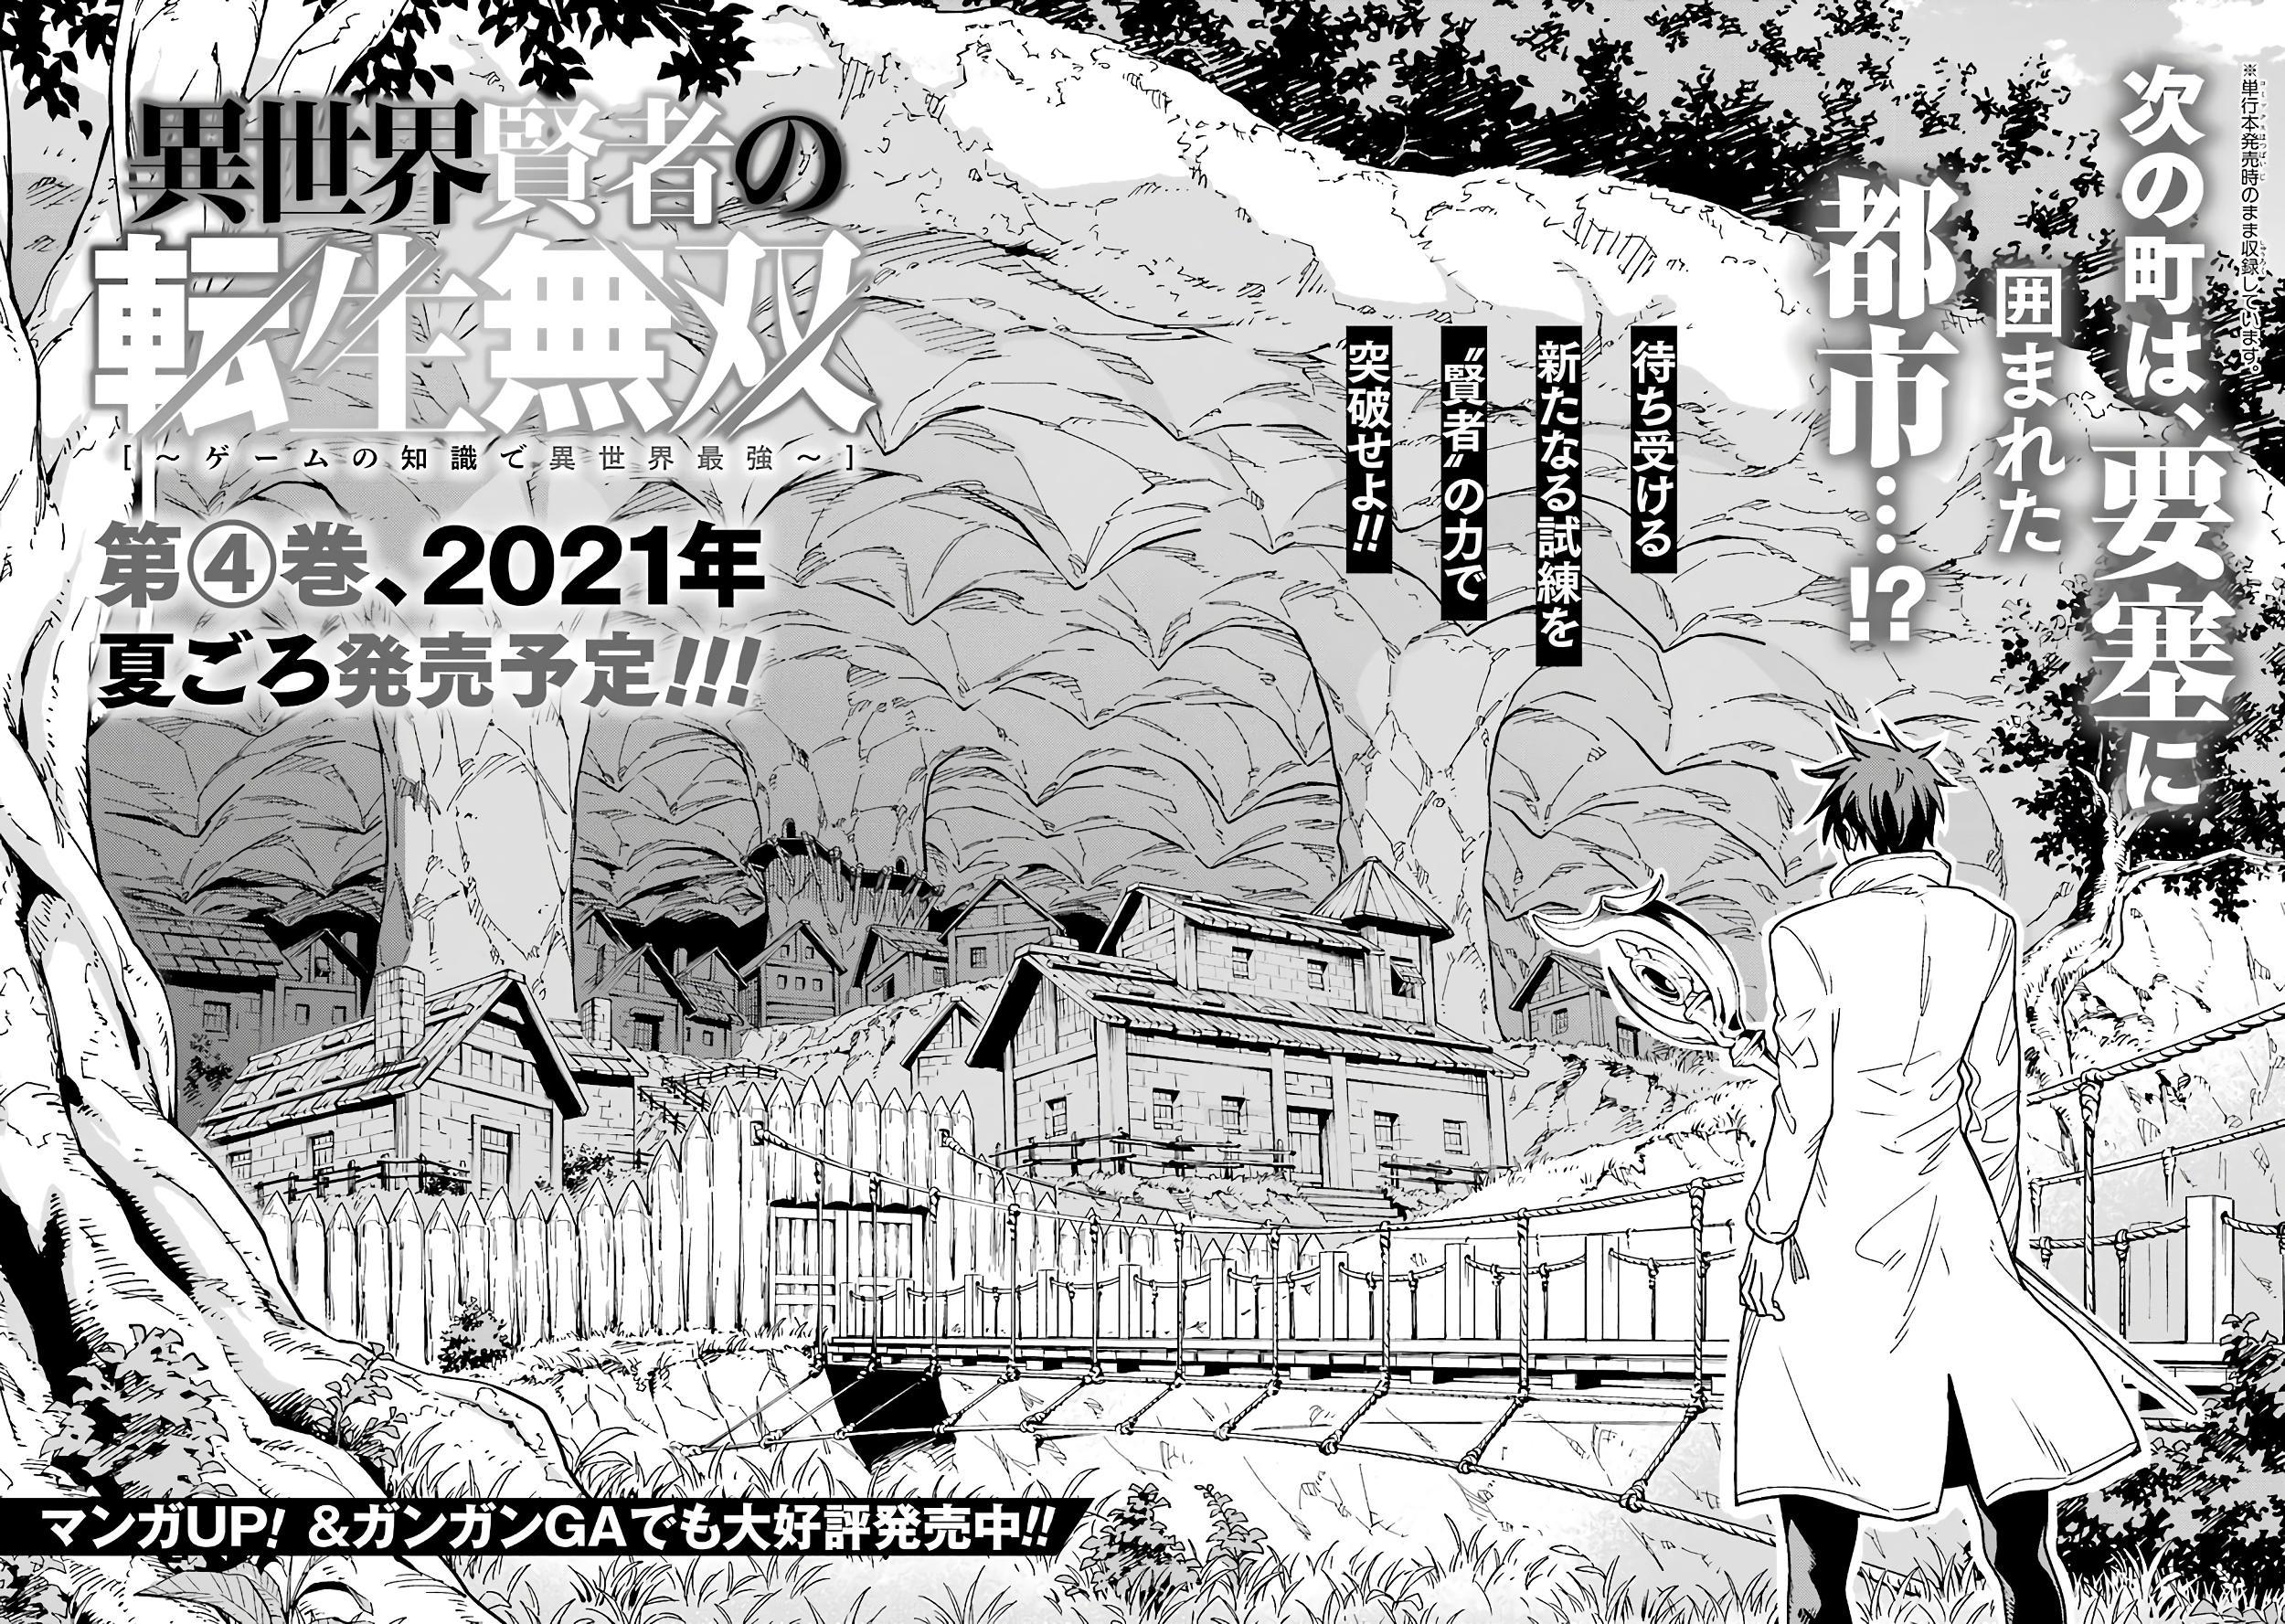 Isekai Kenja No Tensei Musou ~Geemu No Chishiki De Isekai Saikyou~ Vol.3 Chapter 14.4: Milia's Determination page 8 - Mangakakalots.com